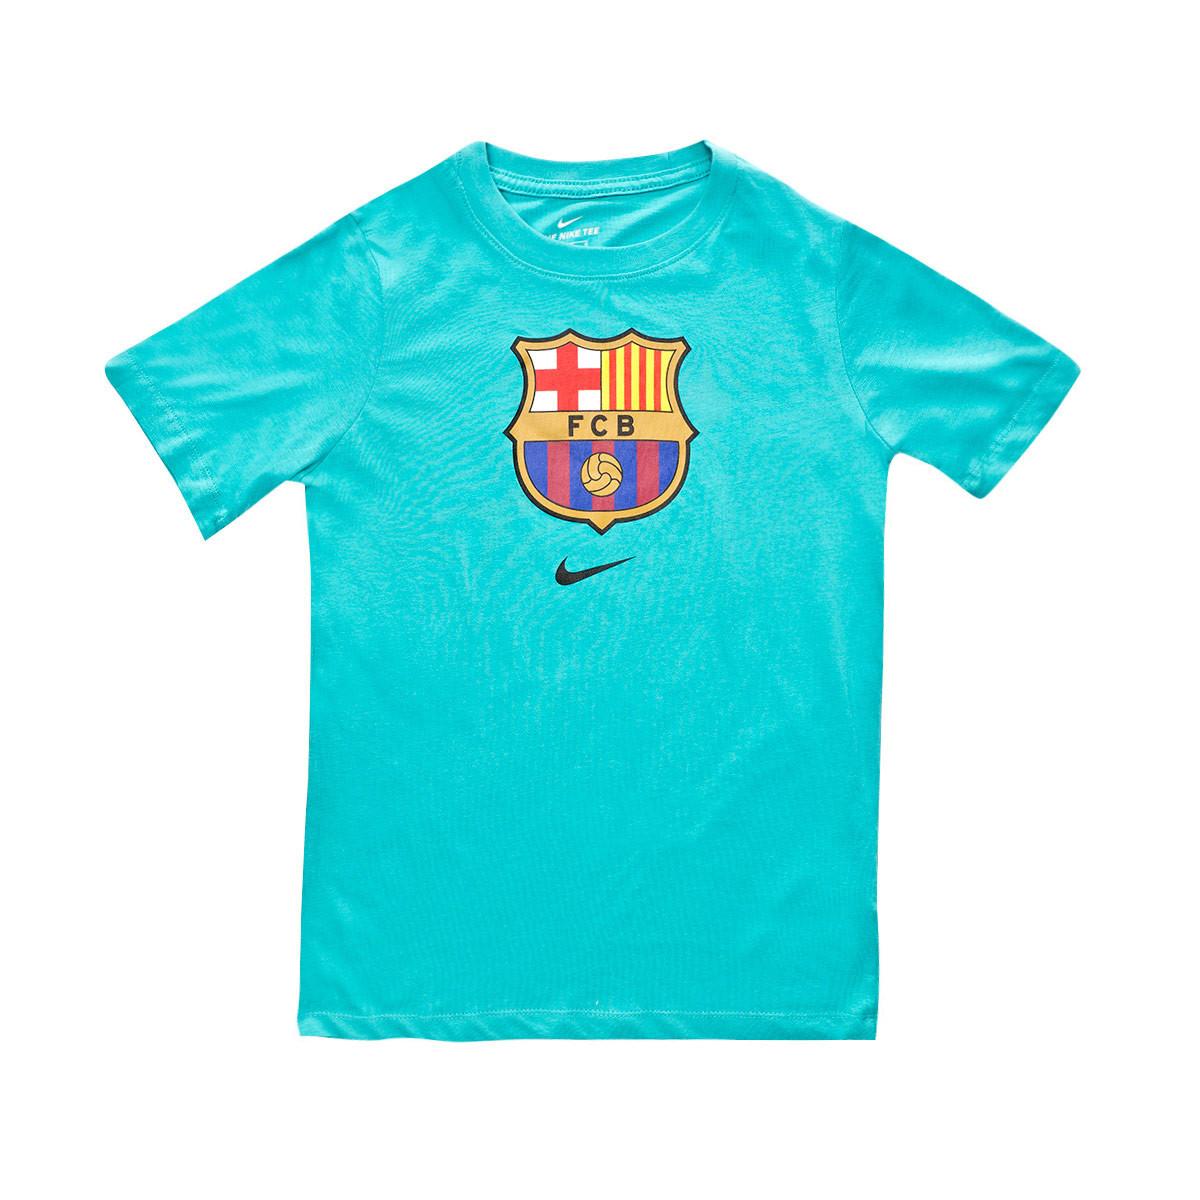 Camiseta Nike FC Barcelona Evergreen 2019 2020 Niño